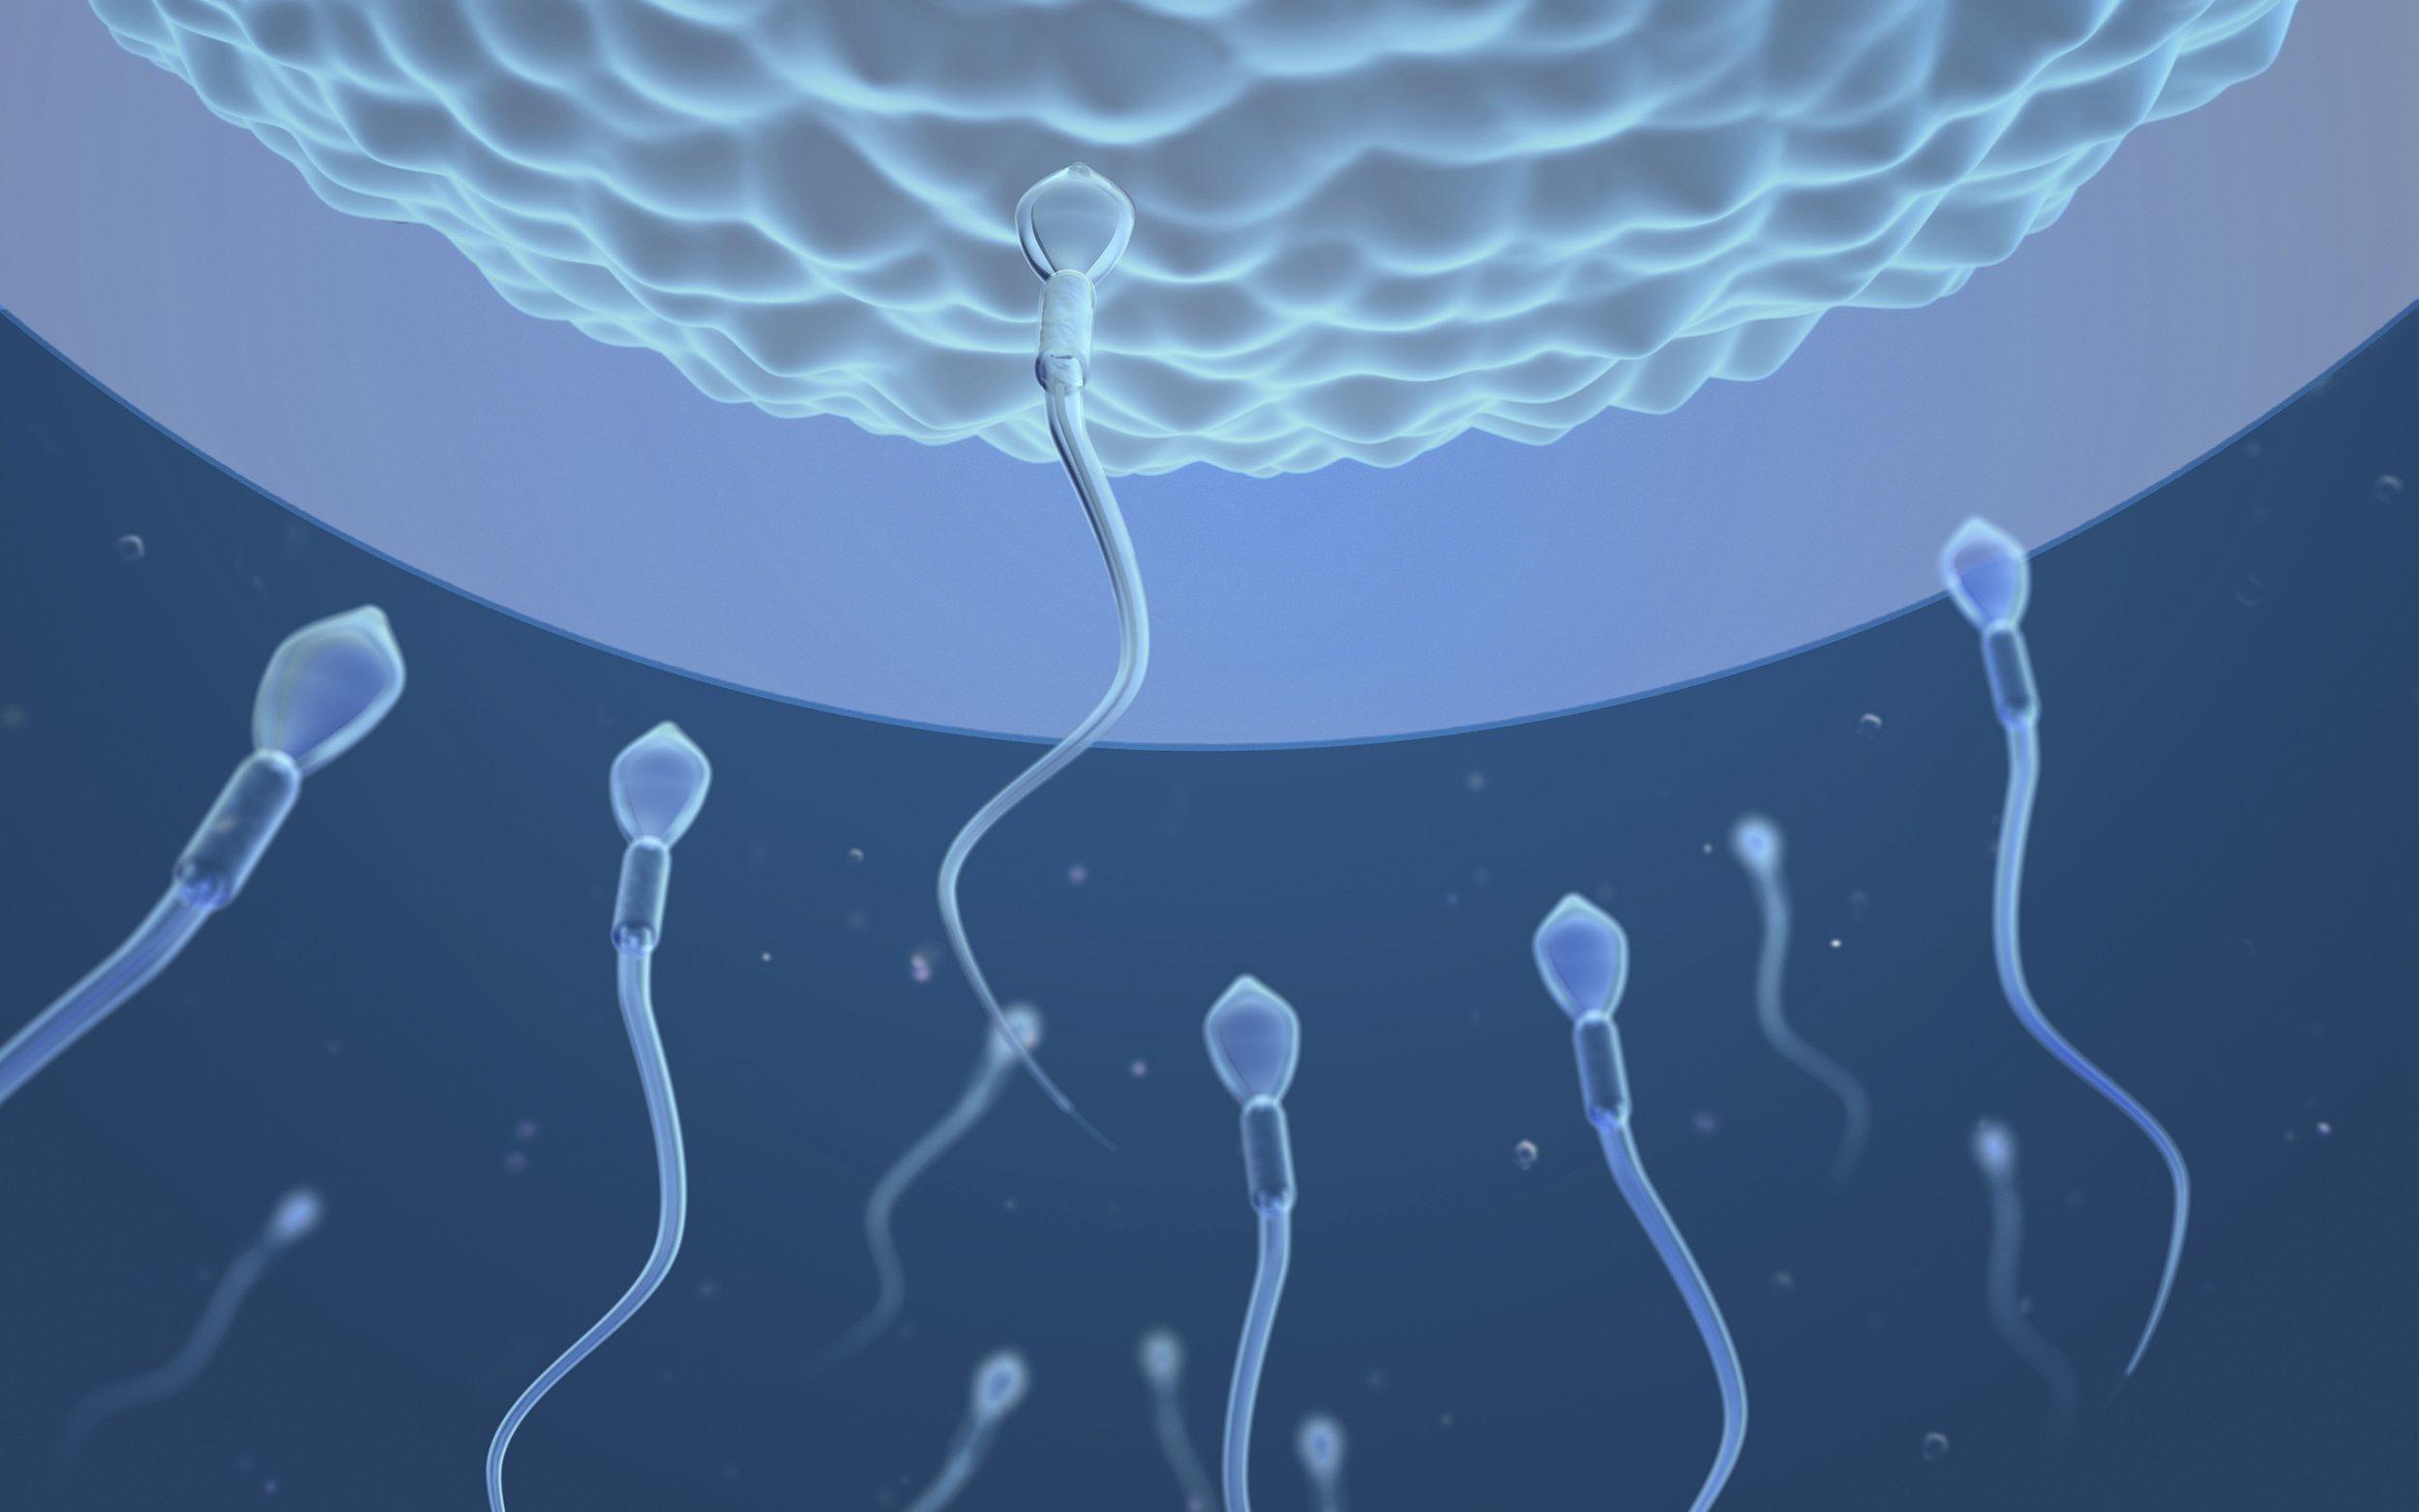 Smoking marijuana may be making your sperm lazy